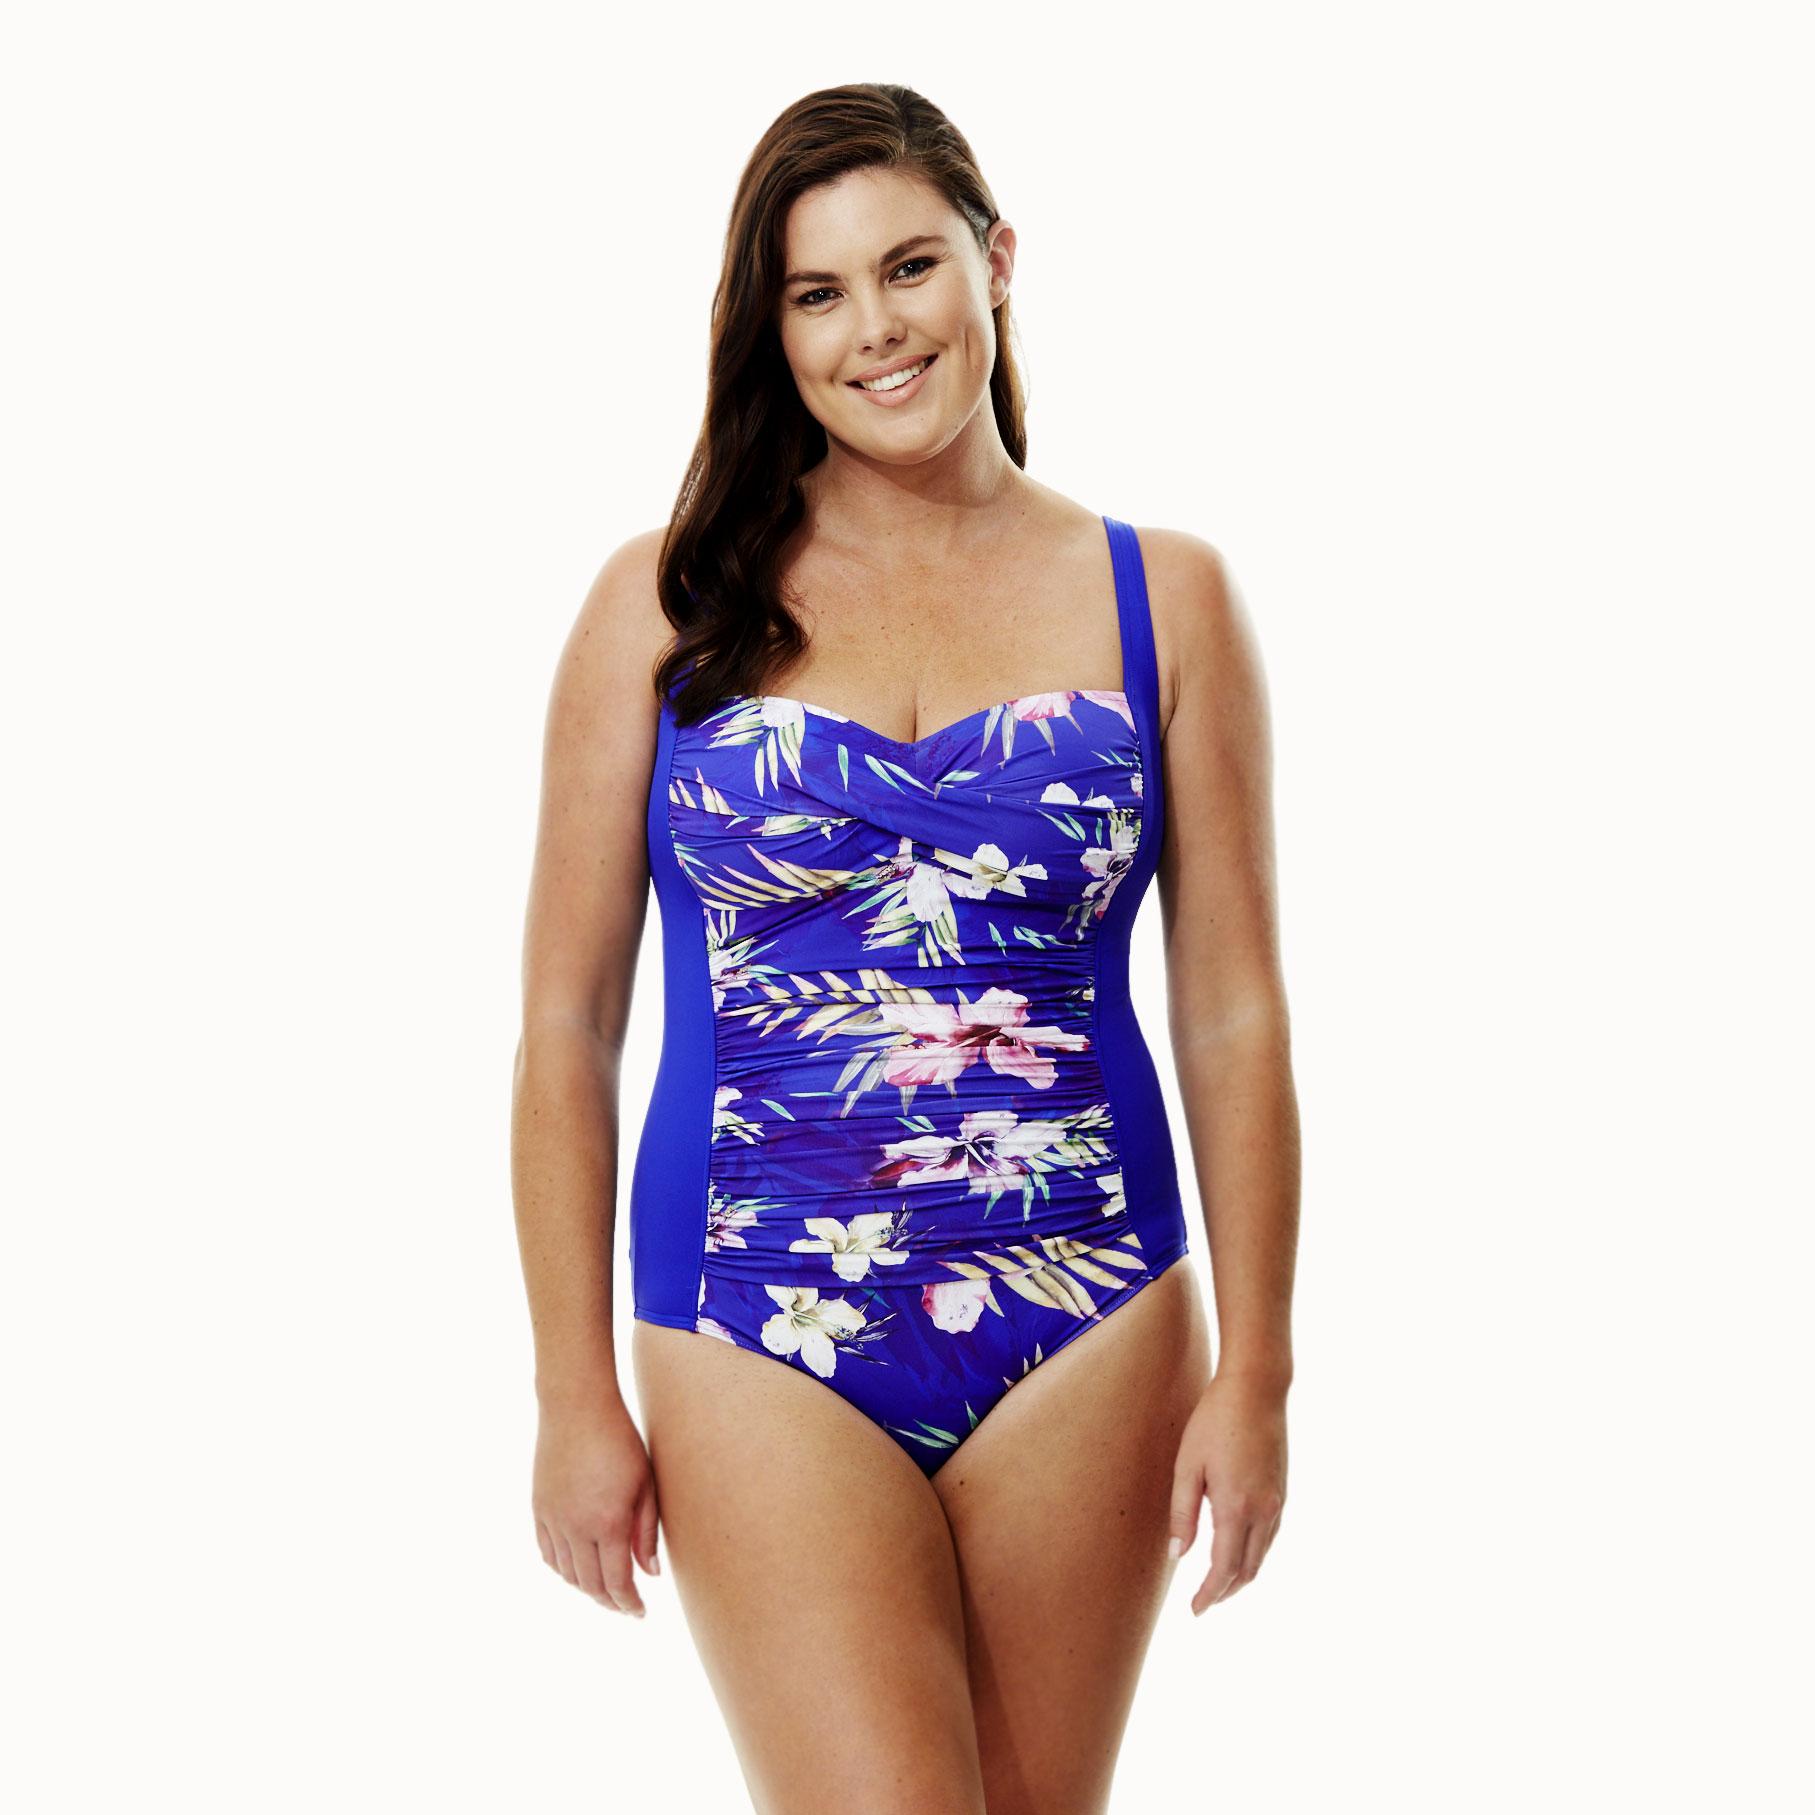 03812055f962 QUAYSIDE Μαγιώ Ολόσωμο σε Γαλάζιο Floral χρώμα | Sexy Melia